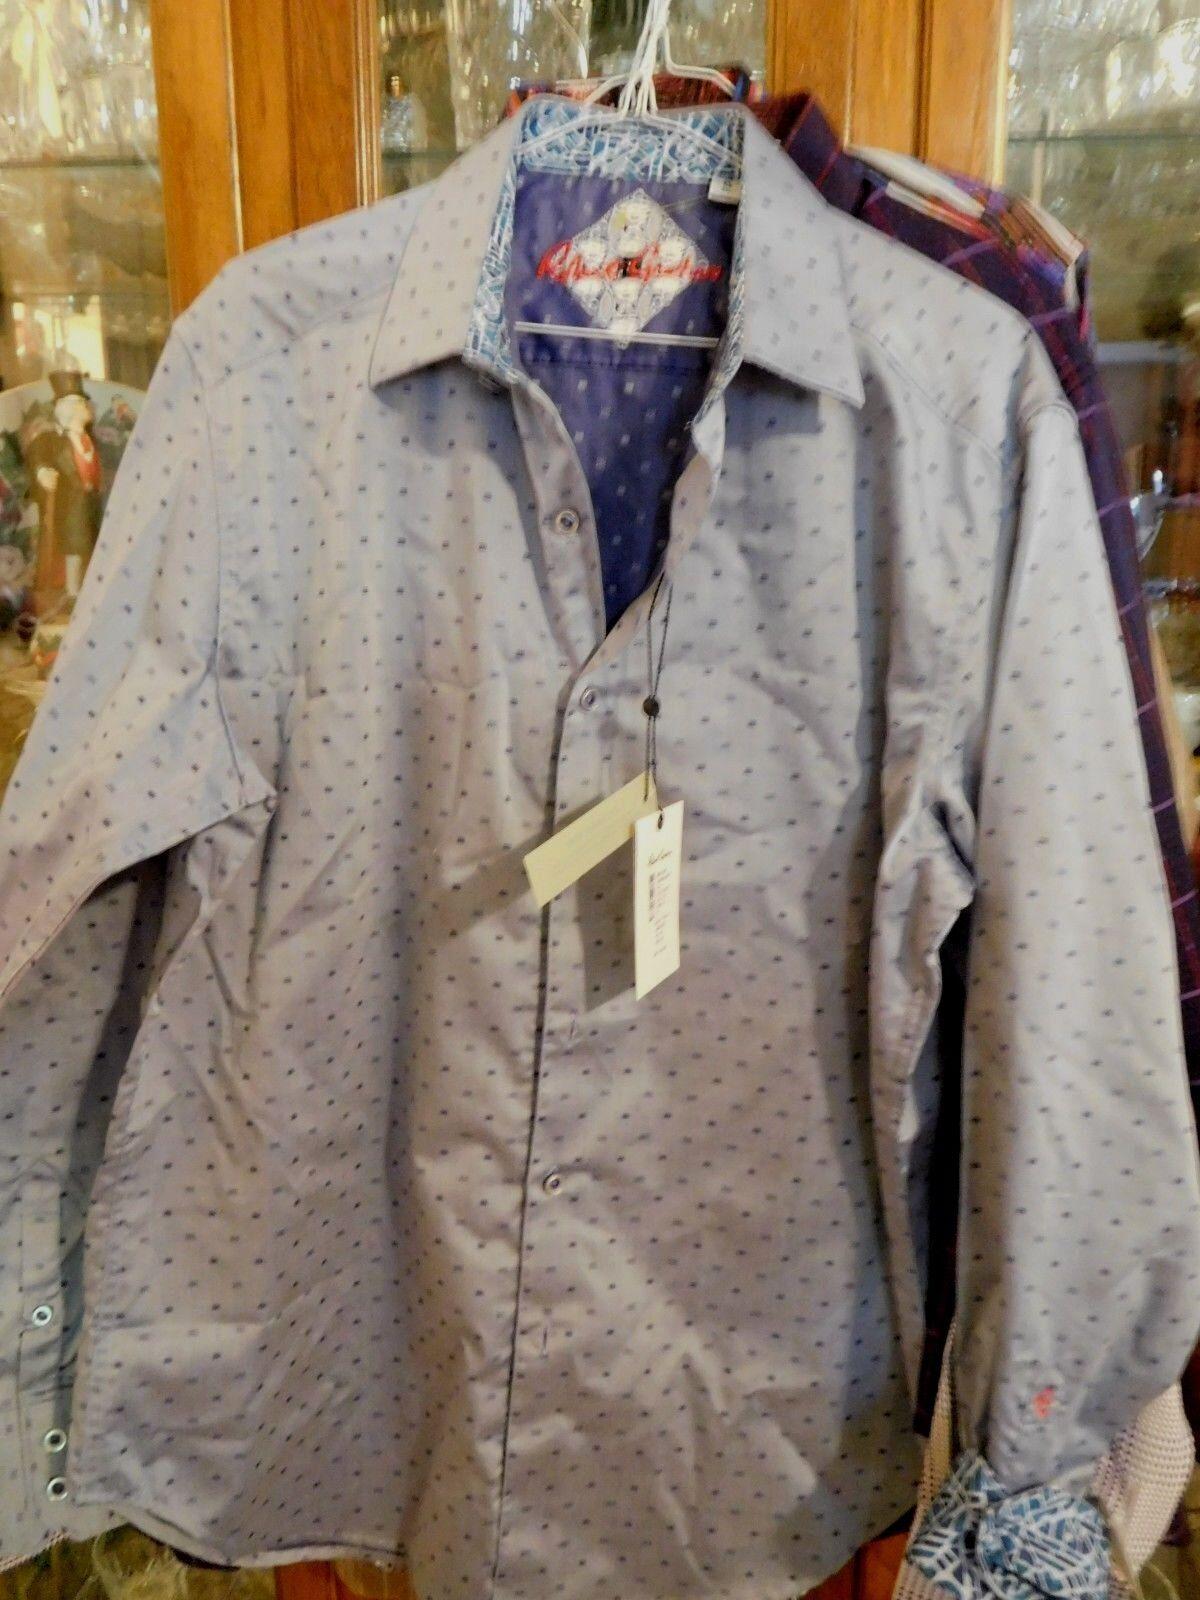 NWT Davide Cenci Midnight blu & bianca Striped Polo Casual Polo Striped Shirt 38/48  195 abeaaa